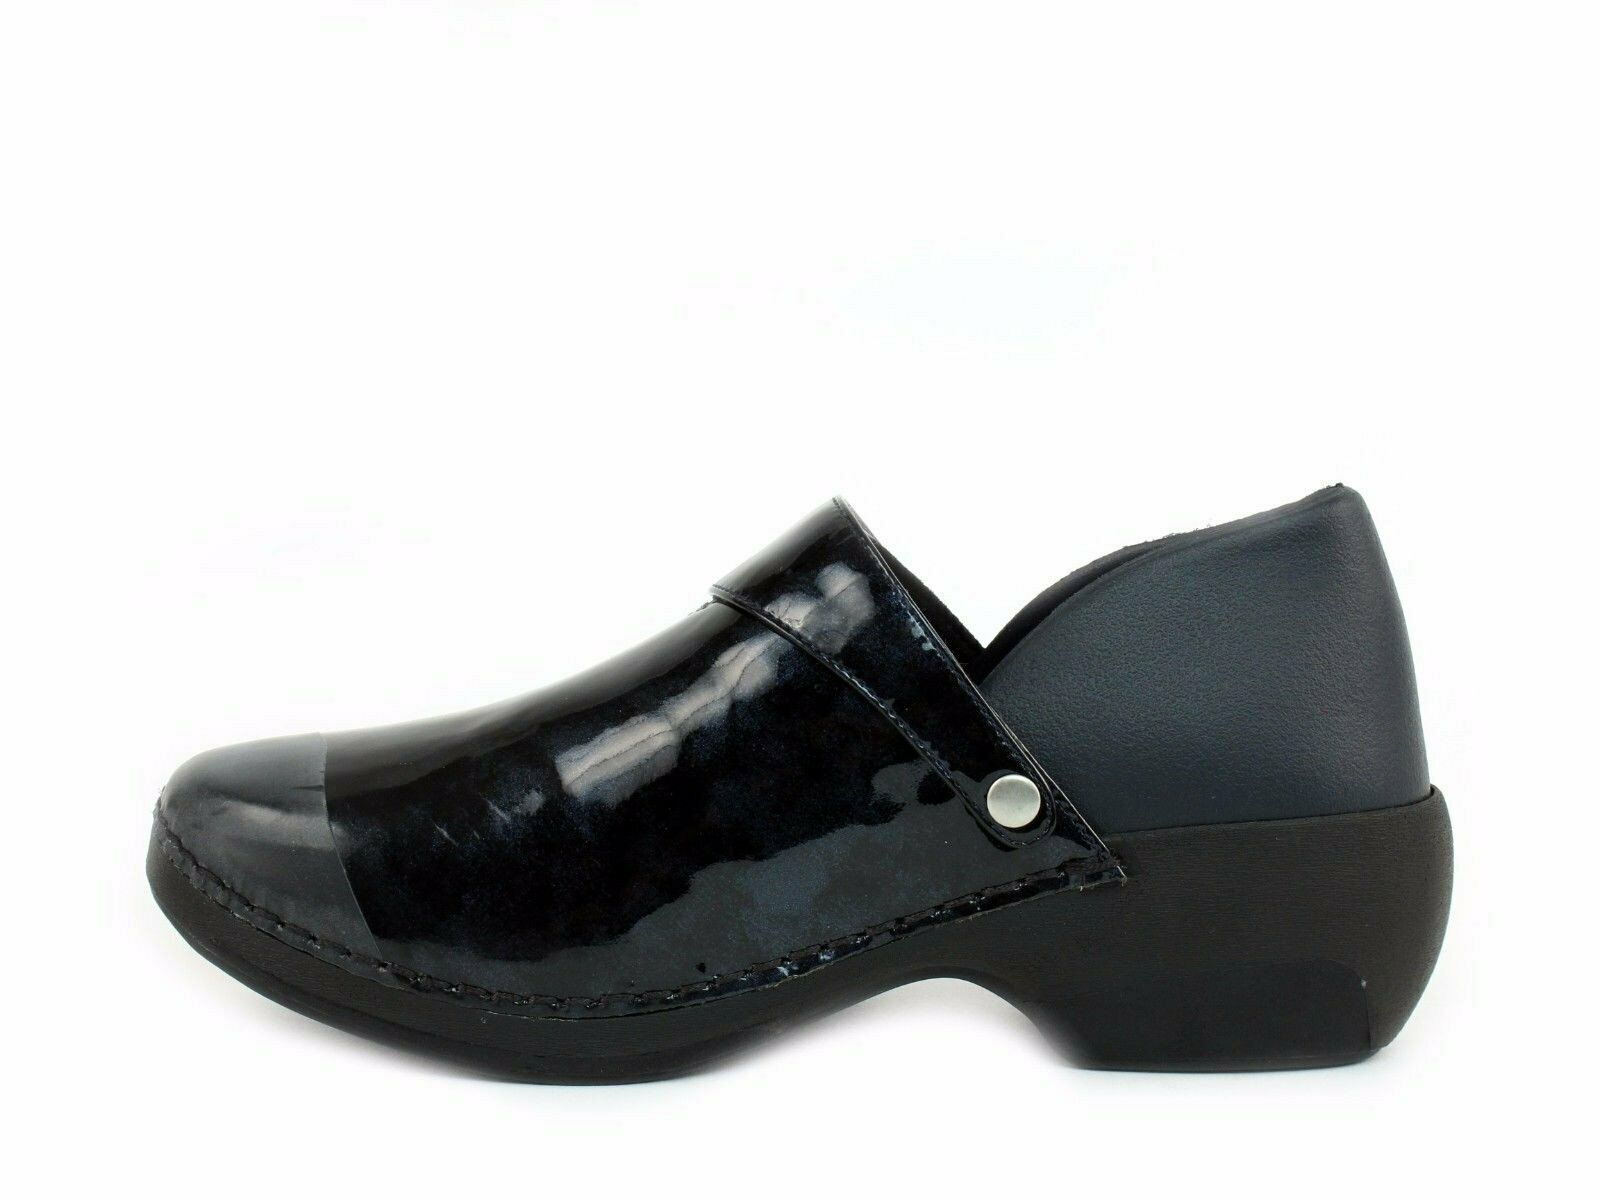 ROCKY 4EurSole Black 3 Styles in 1 Pair Nurse Clogs Slip Resistant 41/10 -10.5